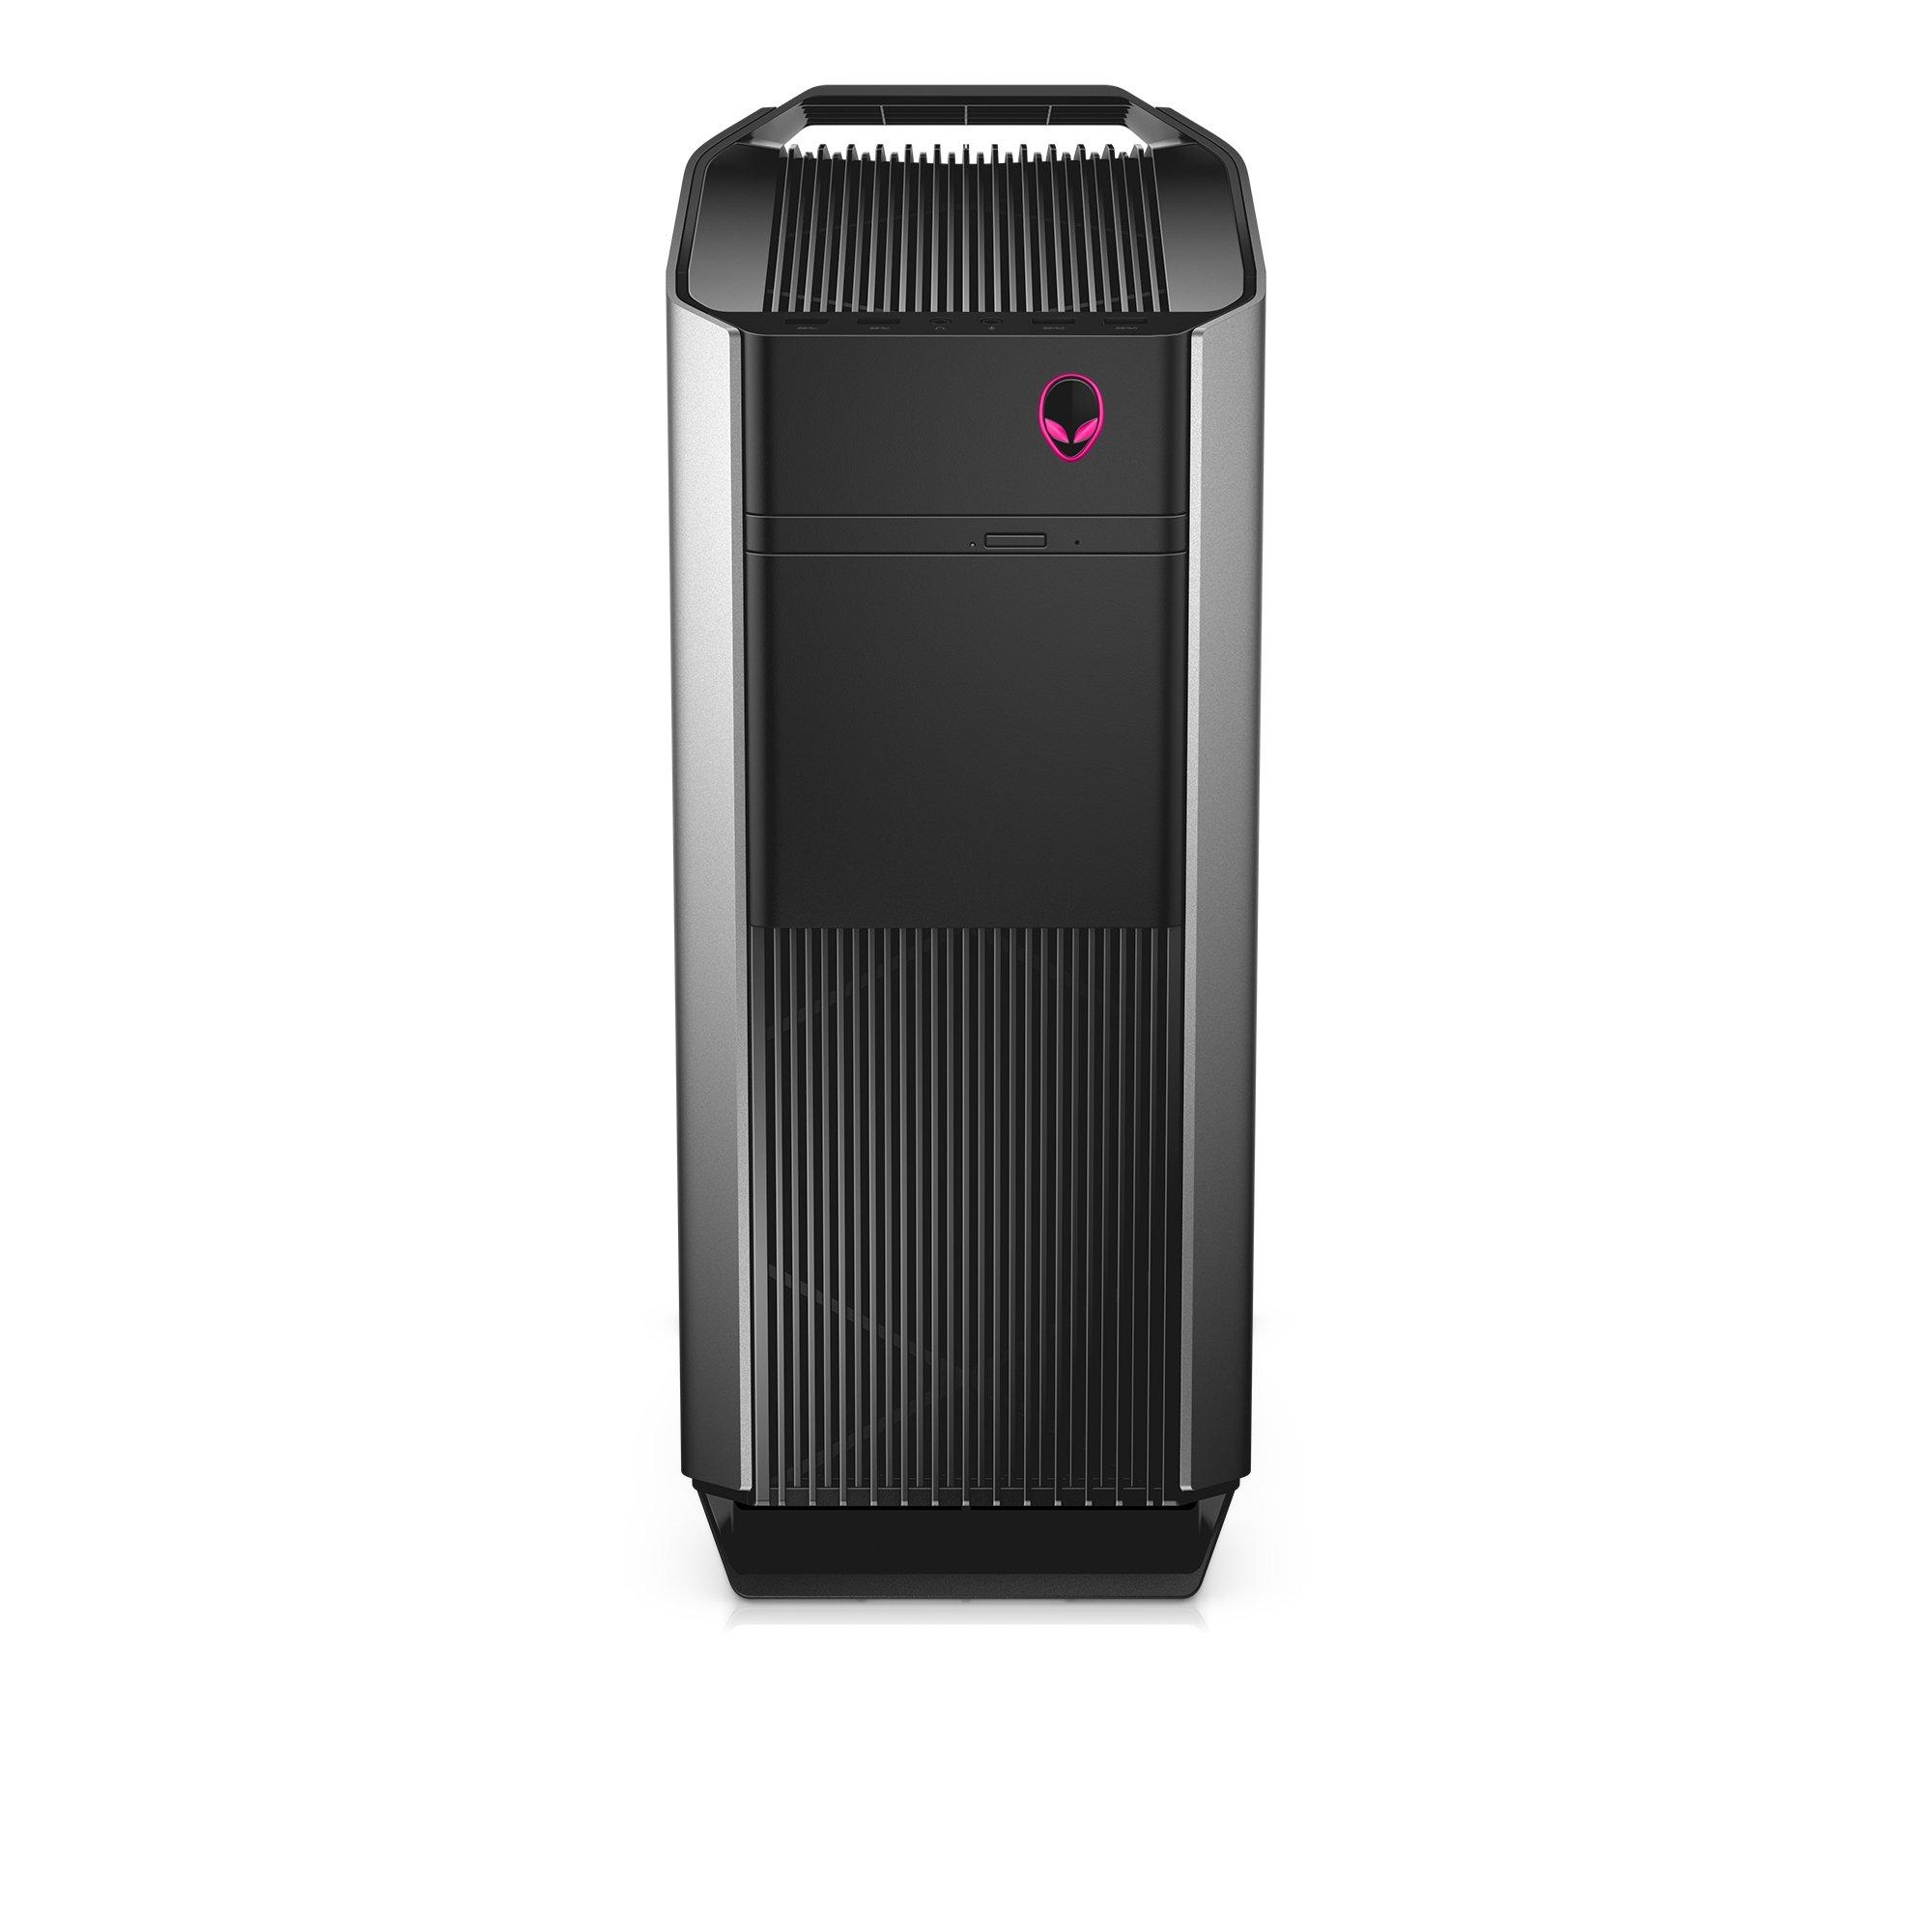 Alienware AUR5-12571SLV Desktop (6th Generation Intel Core i7, 16GB RAM, 256GB SSD + 2TB HDD), Epic Silver by Alienware